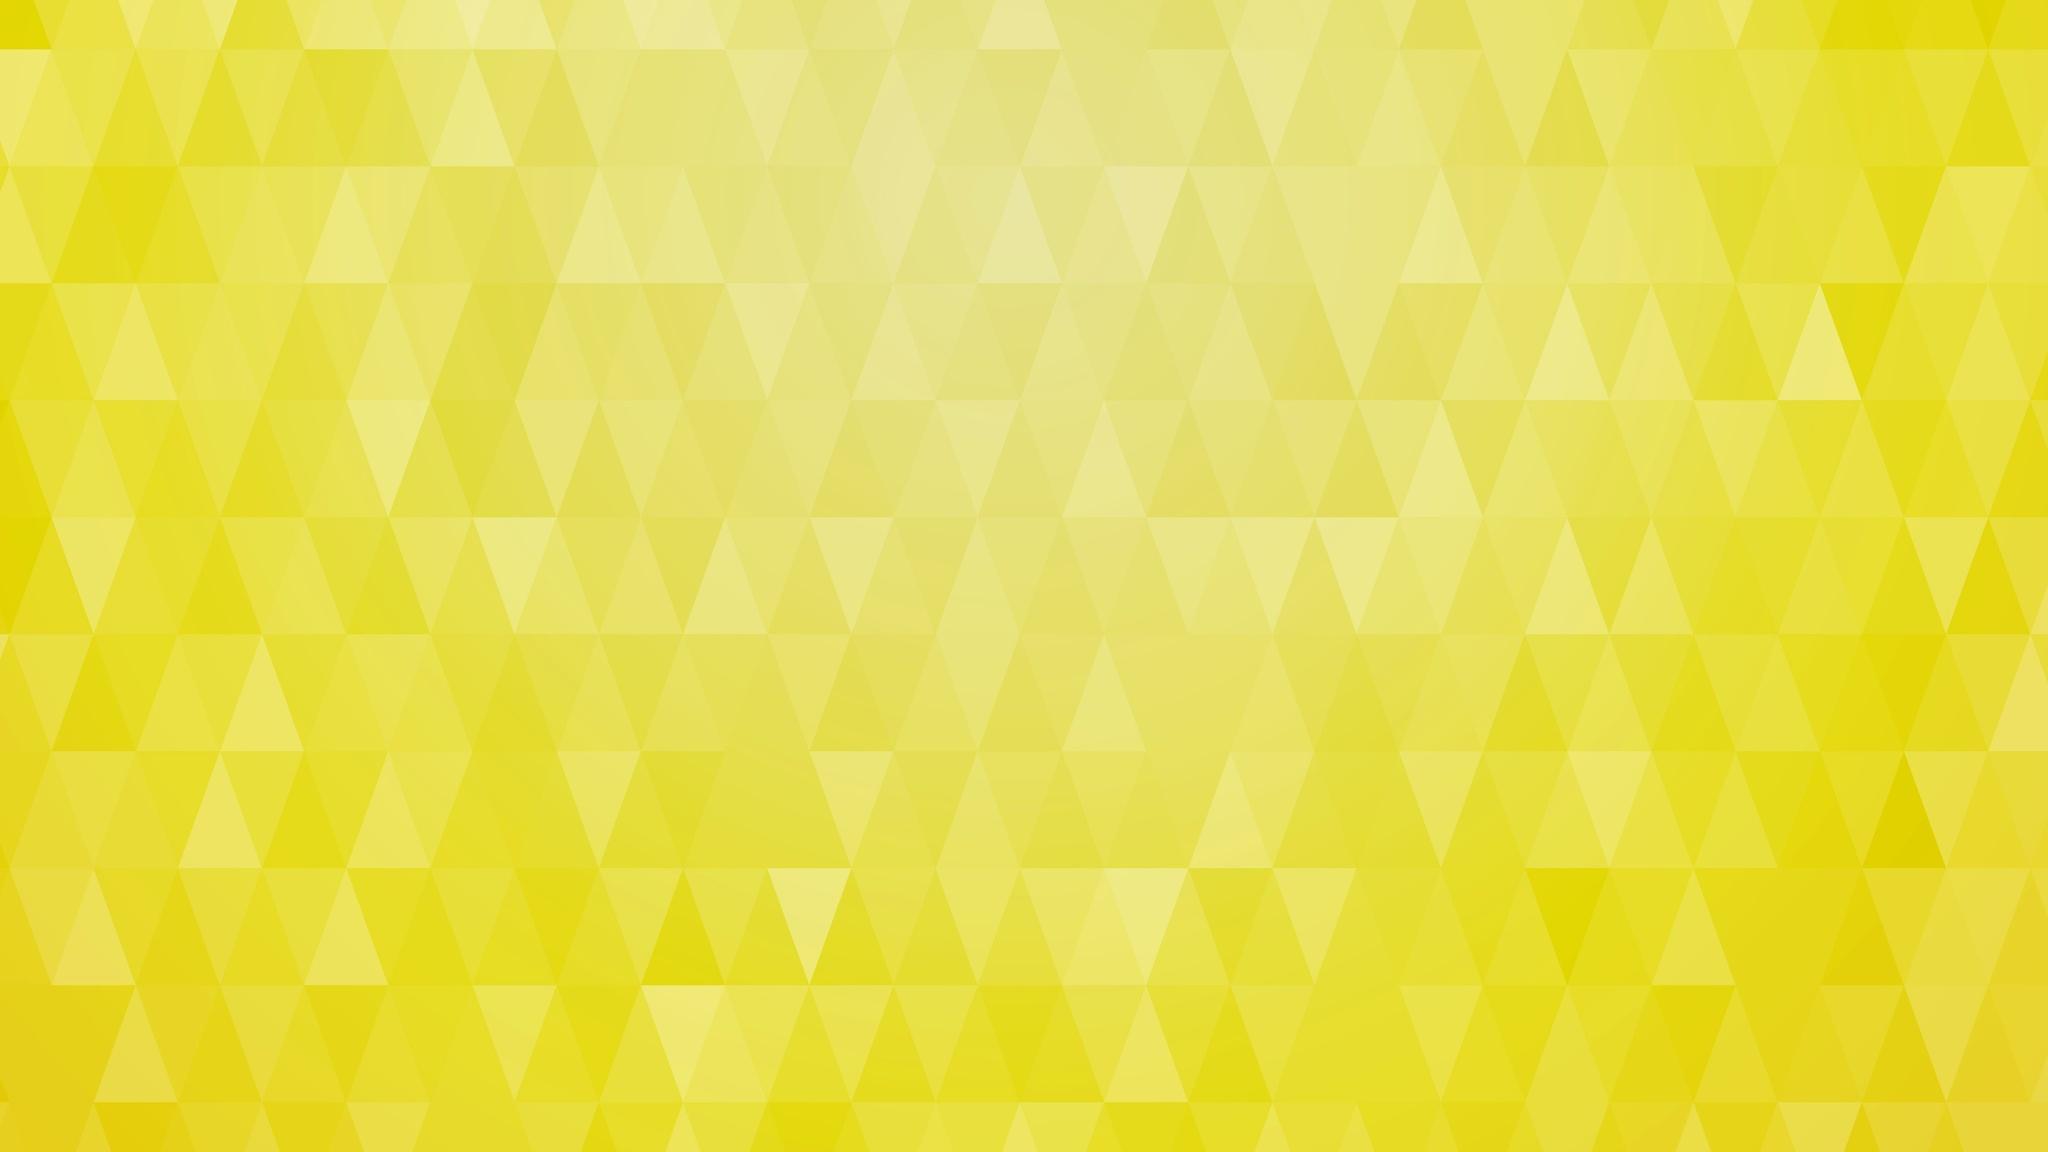 2048x1152 artistic pattern triangle yellow 8k 2048x1152 resolution